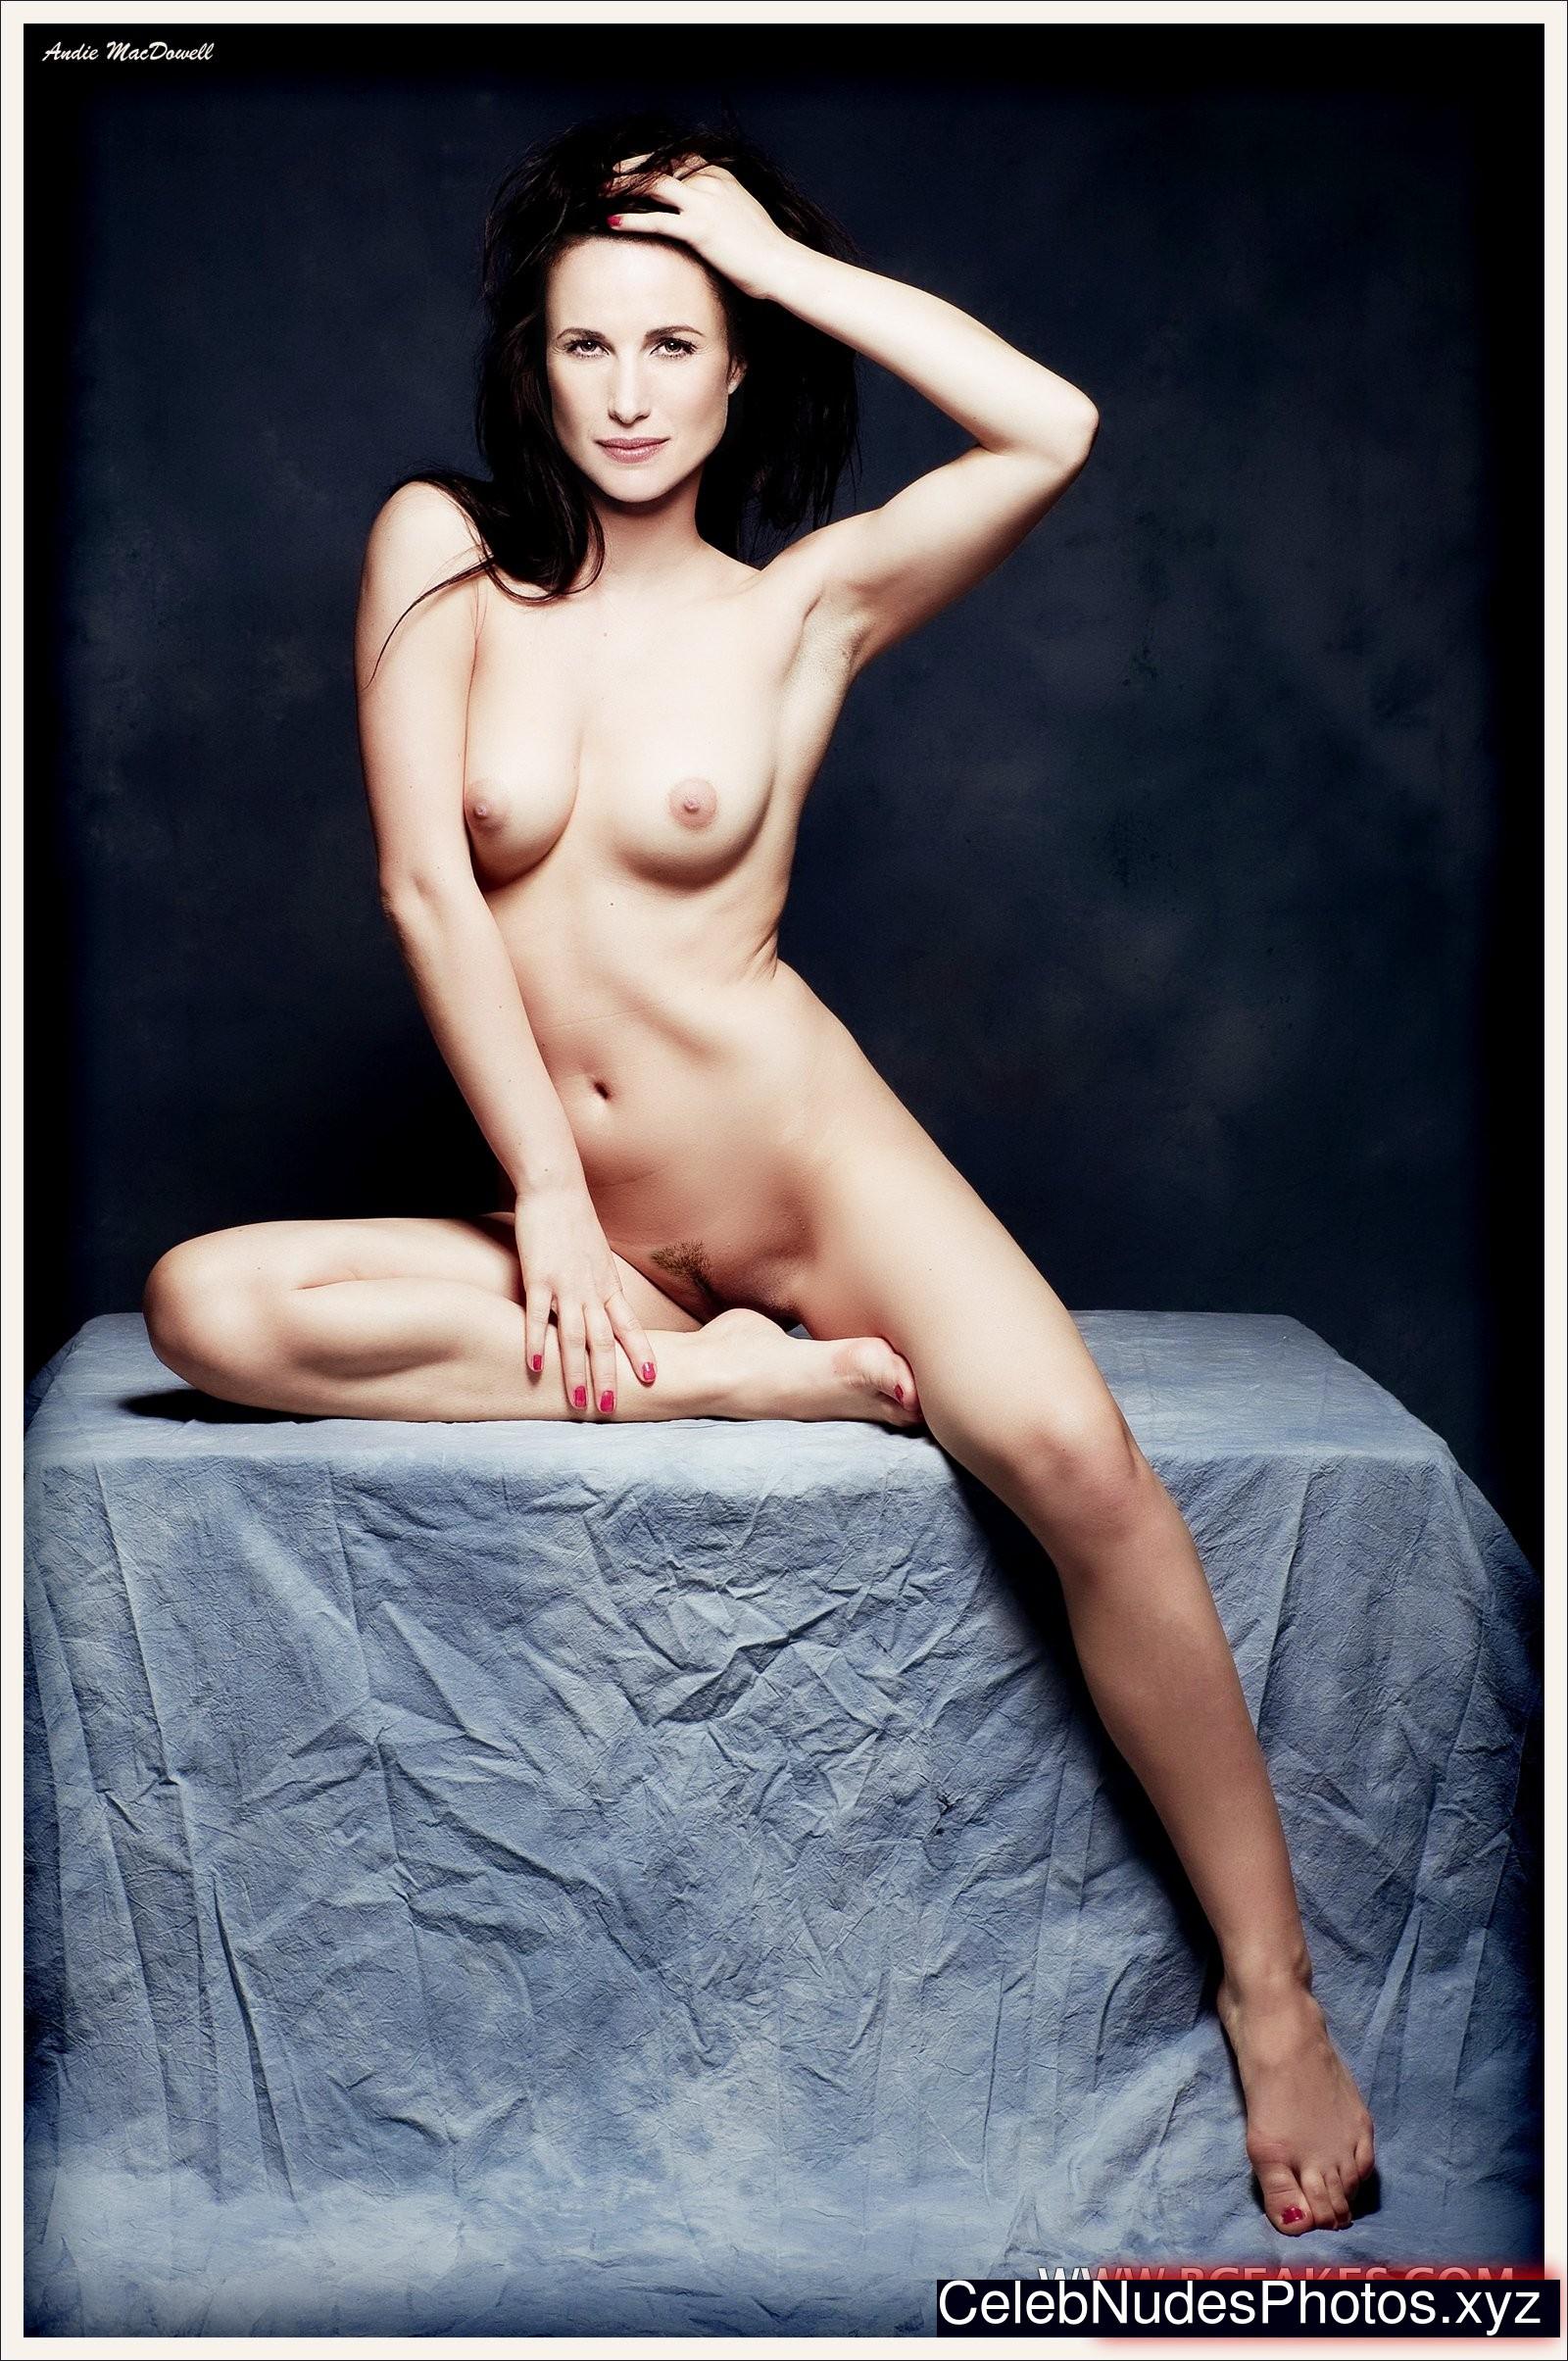 Dirty girl pics nude